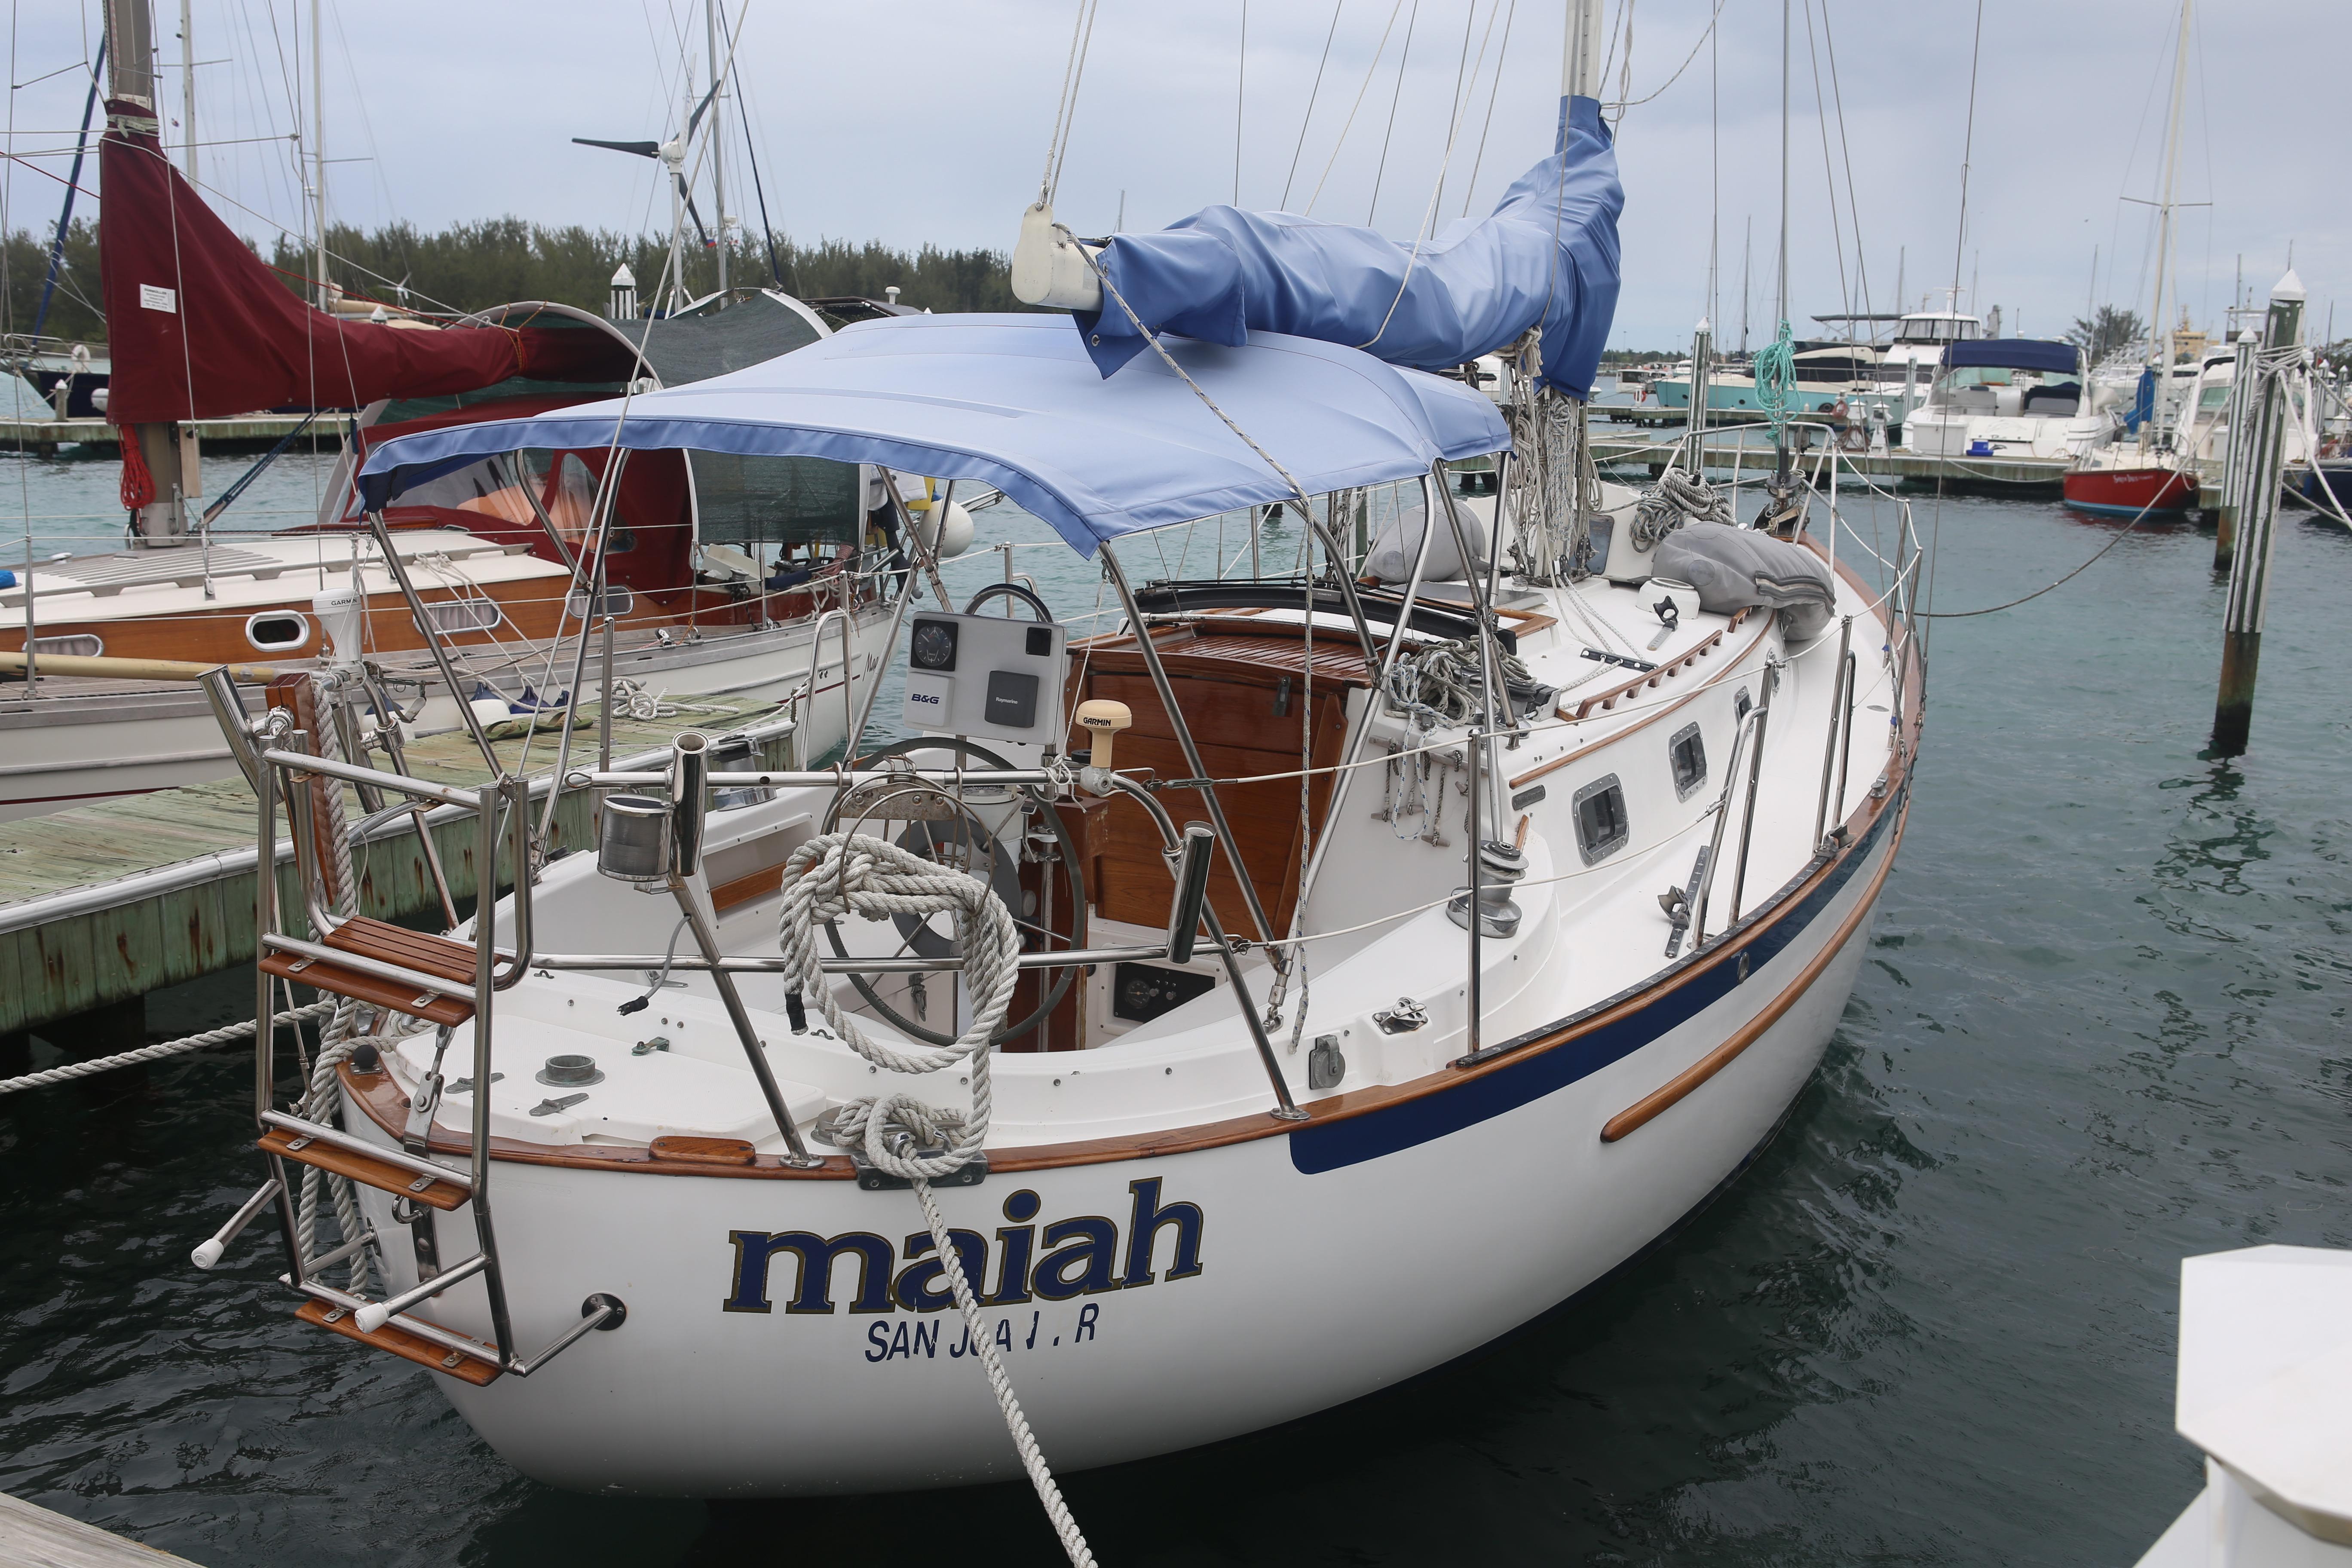 Pacific Seacraft Pacific Seacraft 34